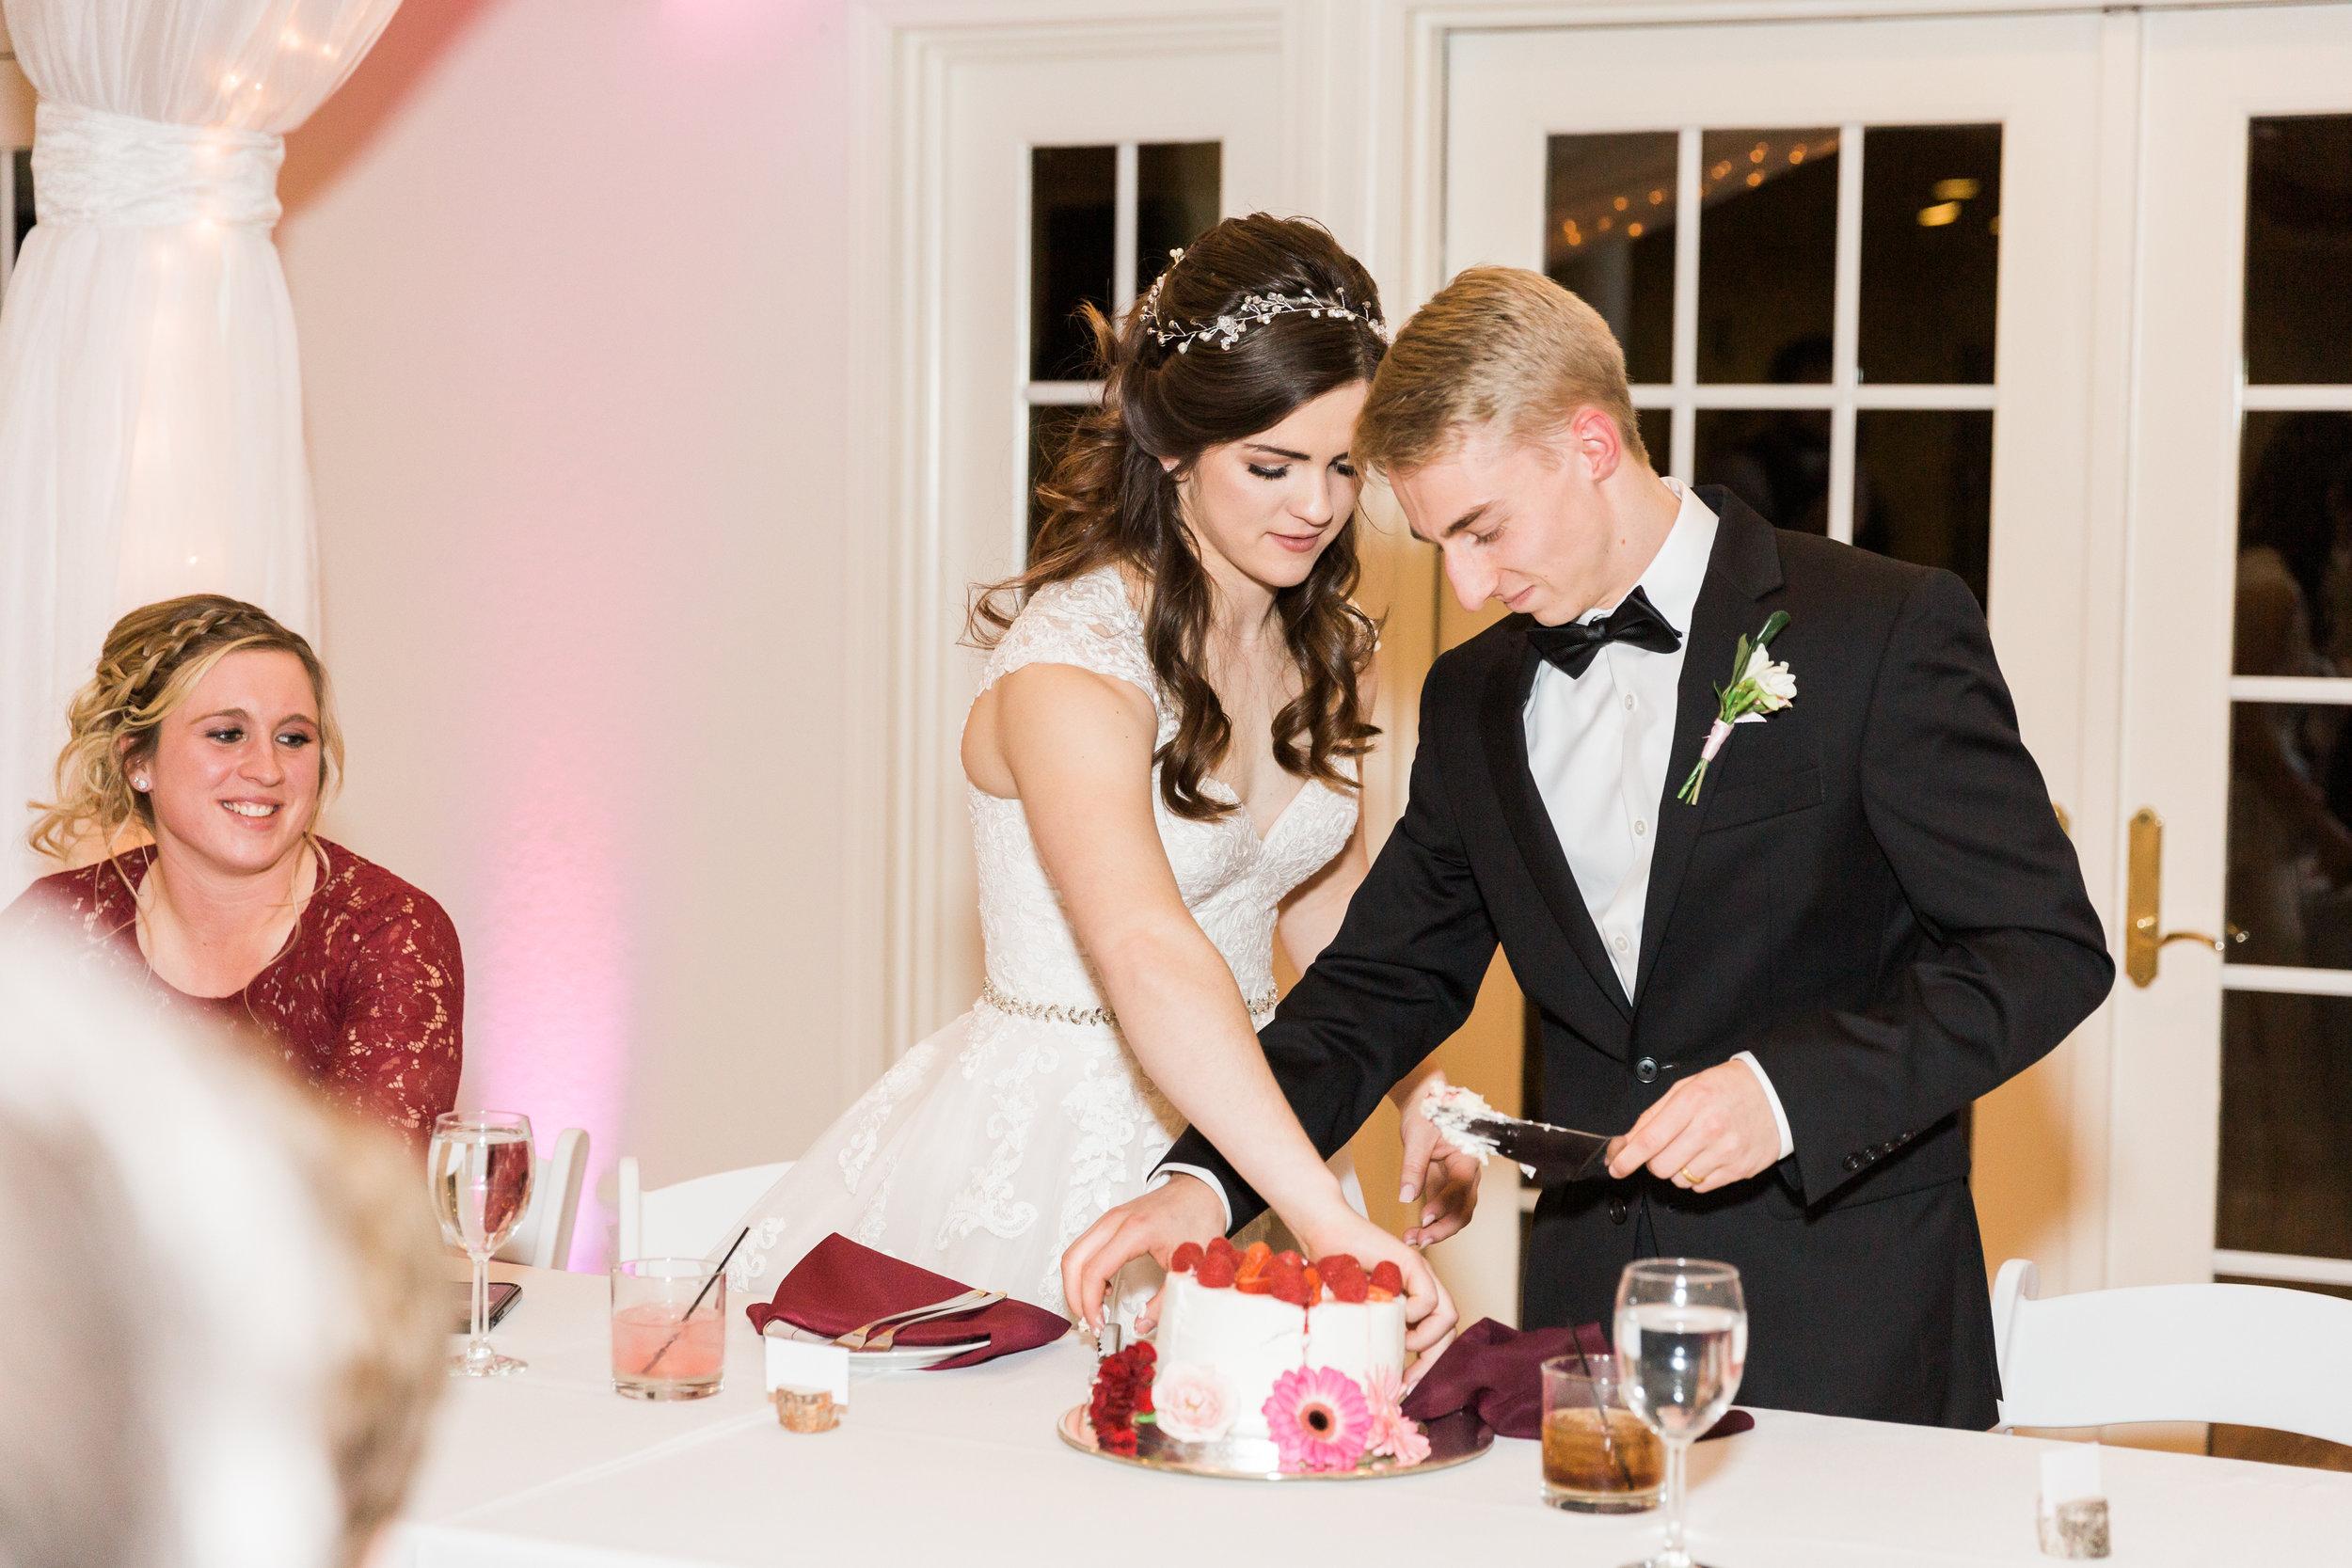 romanticcoloradodestinationwedding-52.jpg